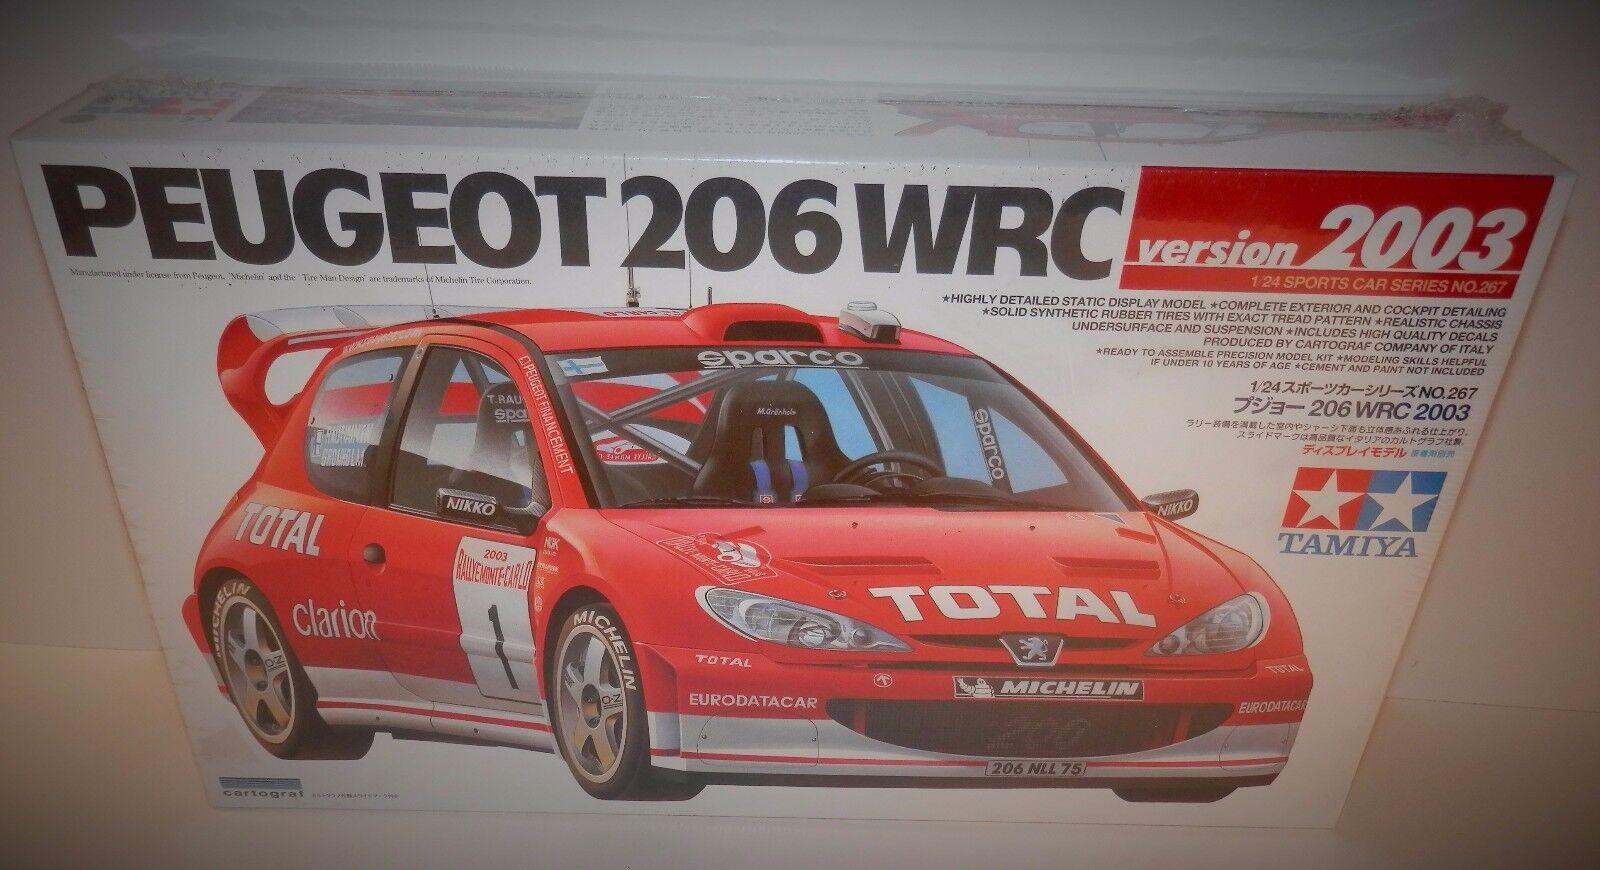 Tamiya 1 24 Peugeot 206 WRC Version 2003 NIB